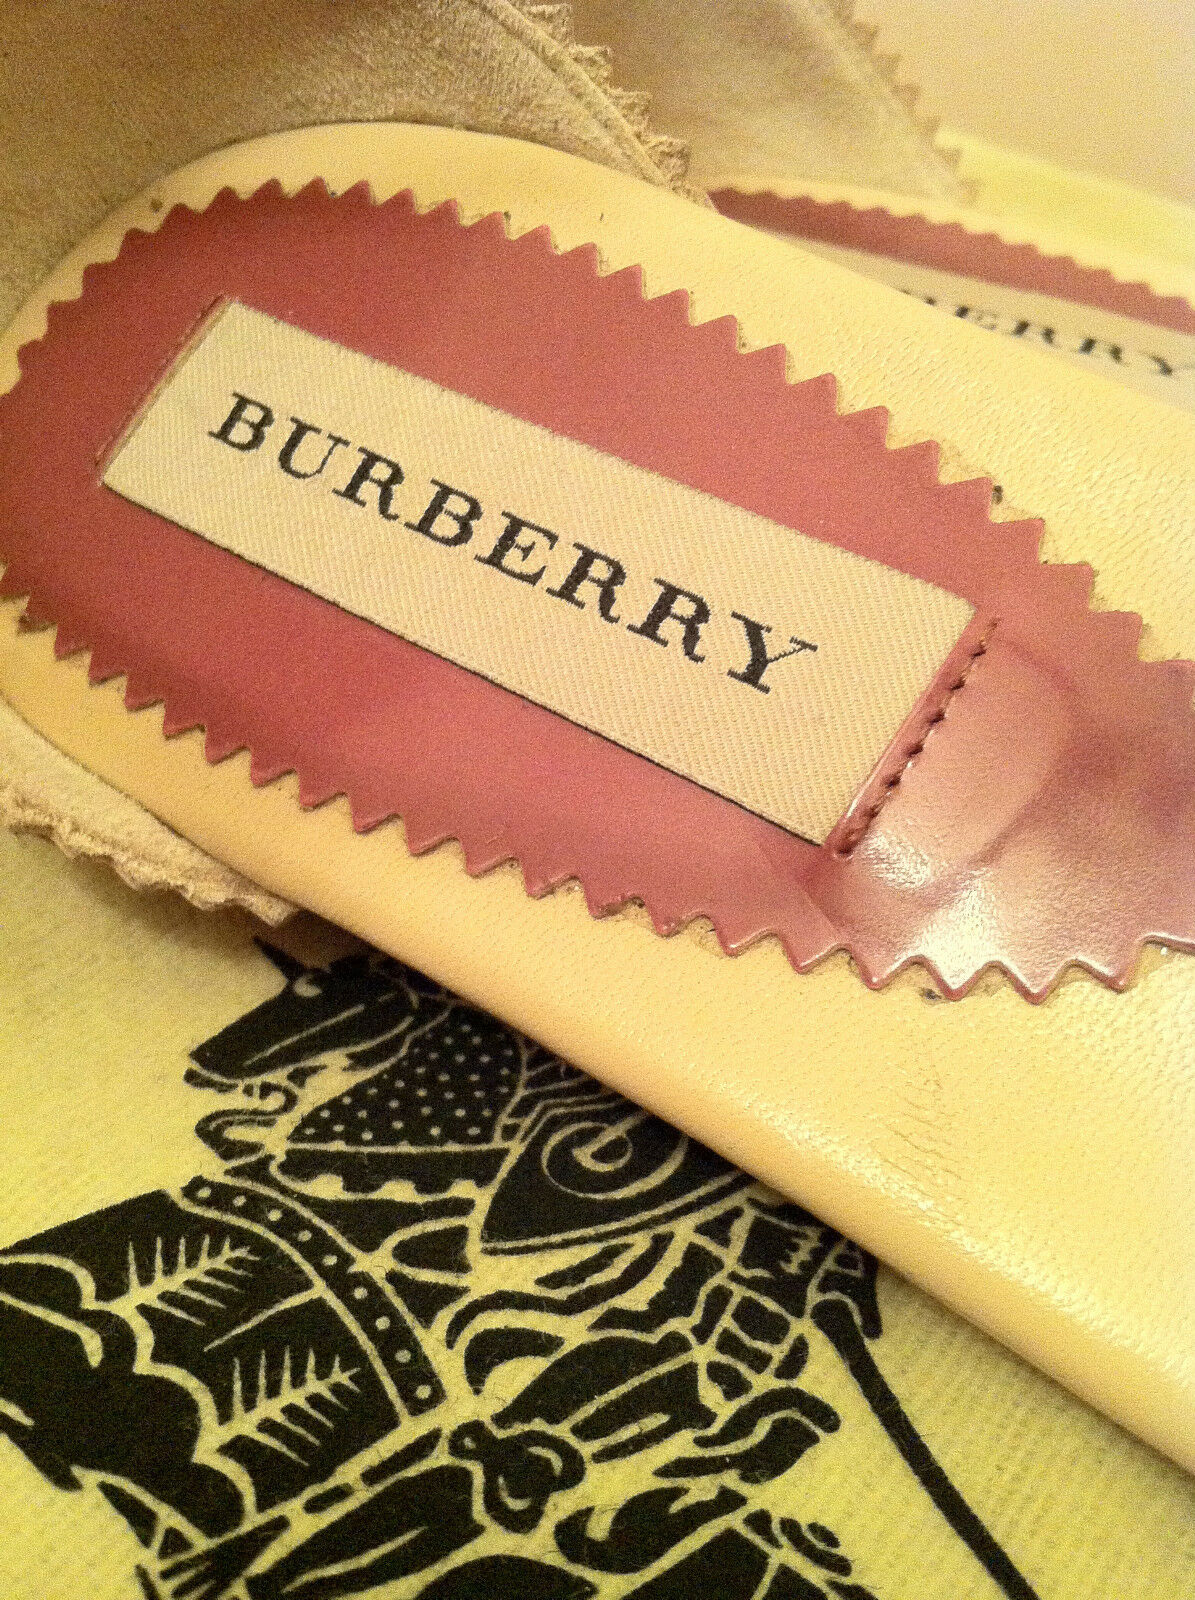 BURBERRY PURPLE WOMEN'S FORTUNE GUILLES THORN PURPLE BURBERRY T-STRAP SANDALS   SIZE 37 (7 US) ed1fb6